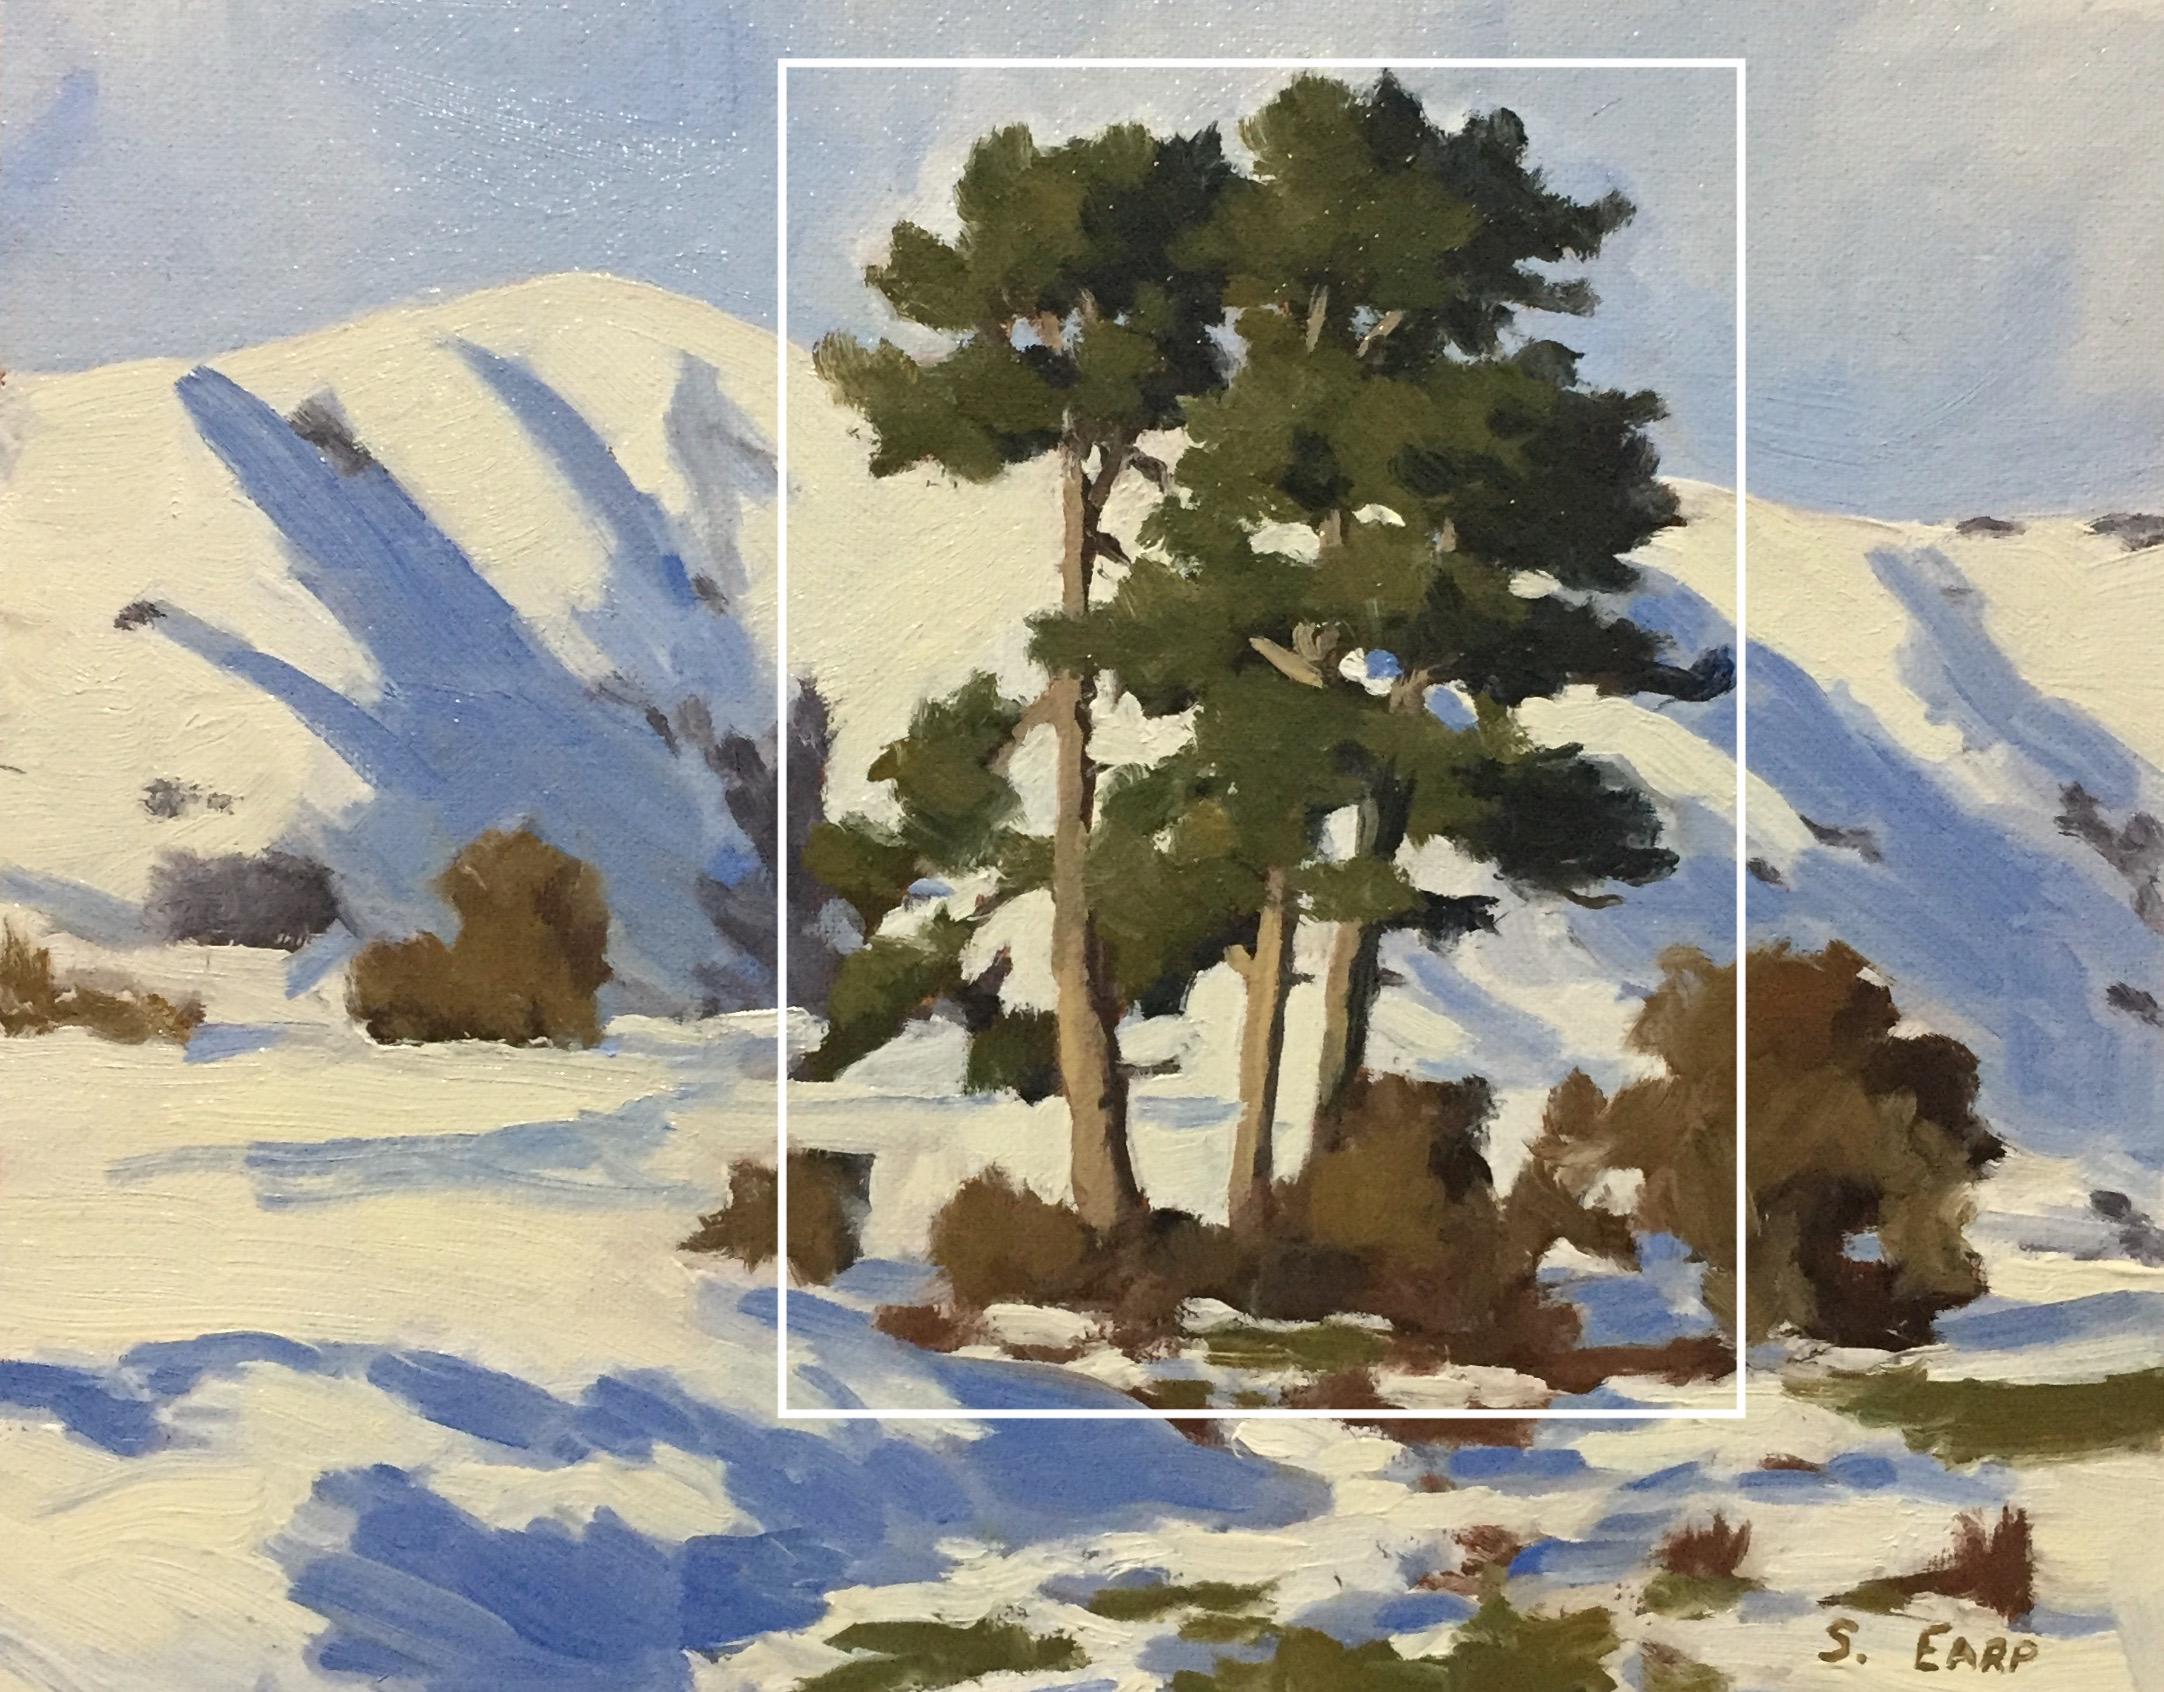 Pine Trees - Tobins Track - Samuel Earp - plein air copy.jpg